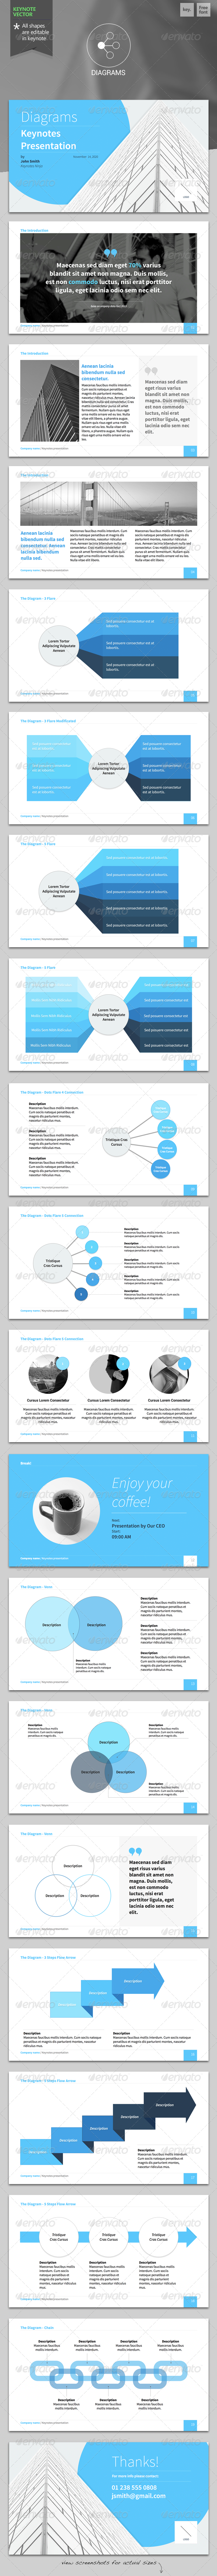 Diagrams - Keynote Template - Keynote Templates Presentation Templates